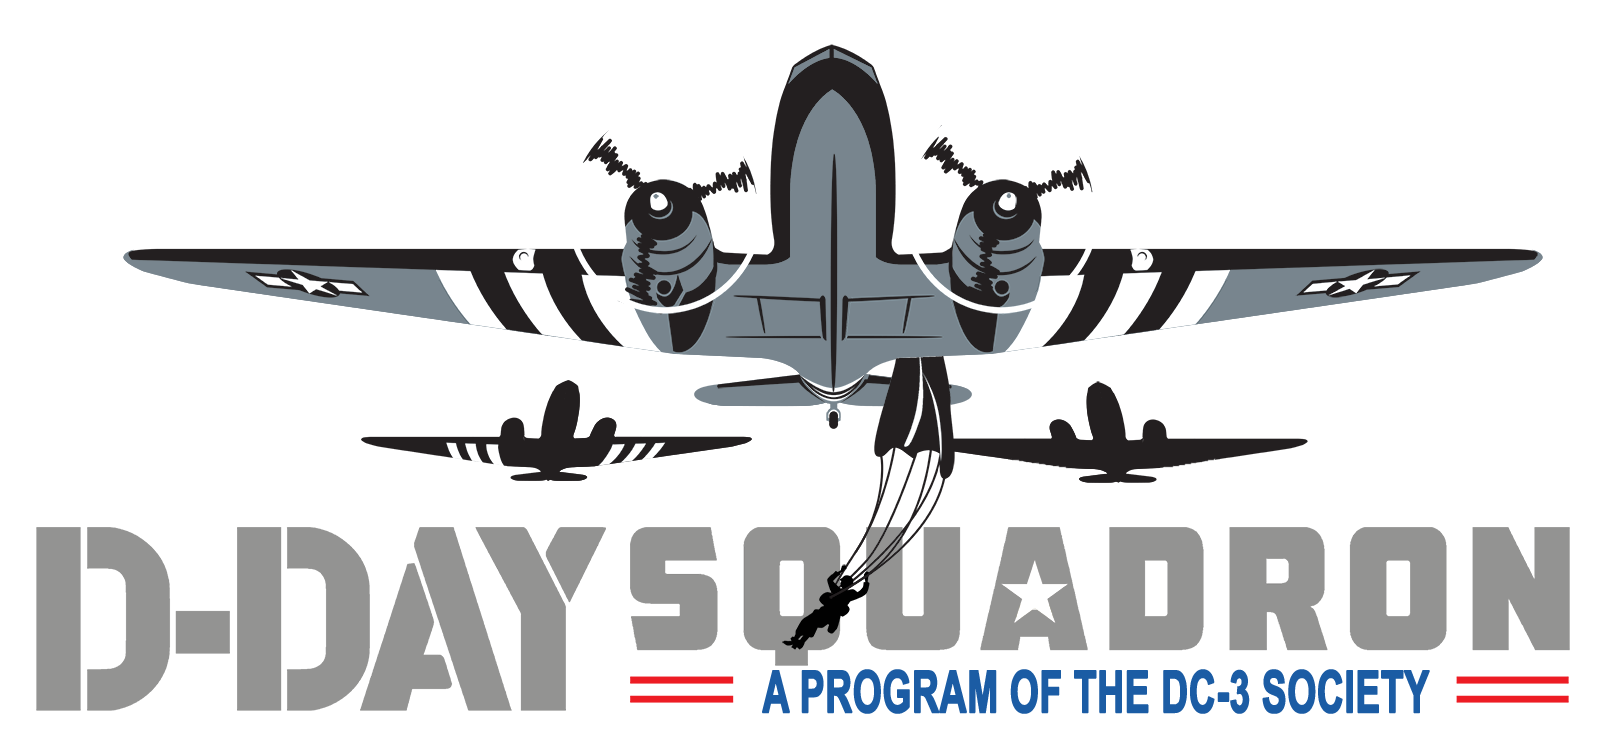 DDay-Squadron-A-DC-3-Society-C-37